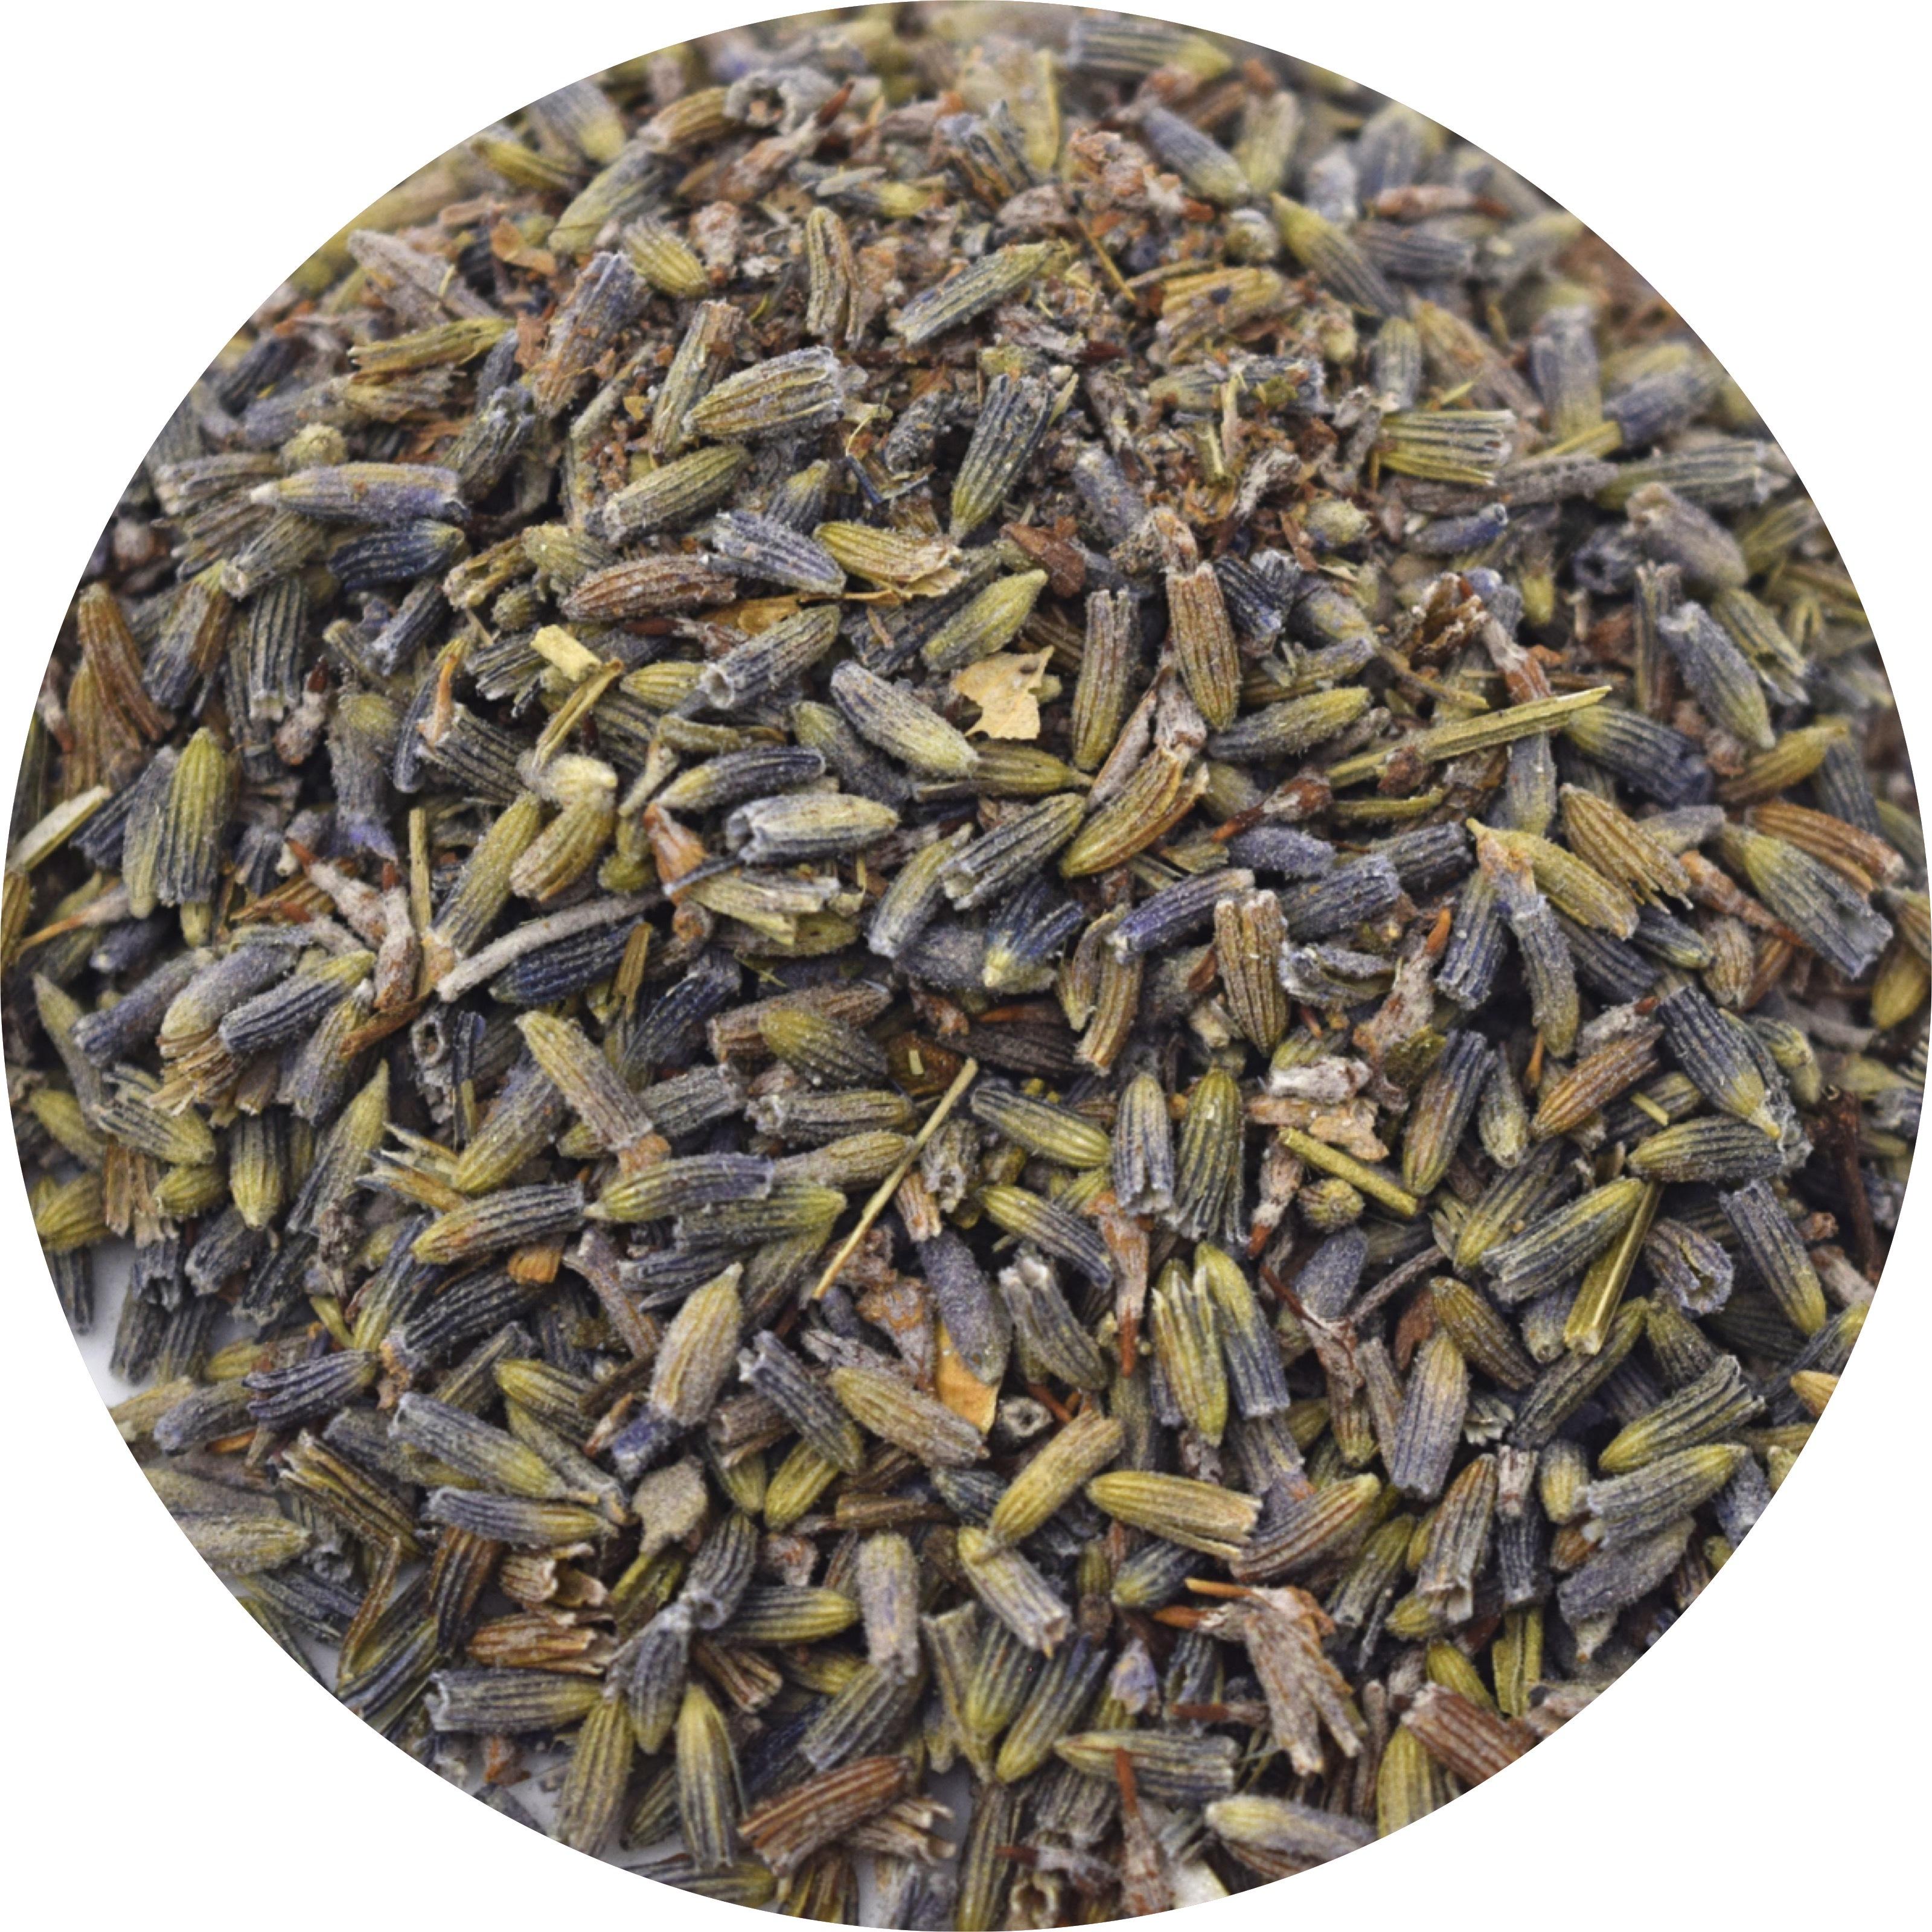 Lavender 4 oz 3T3K7Q6JFT95T